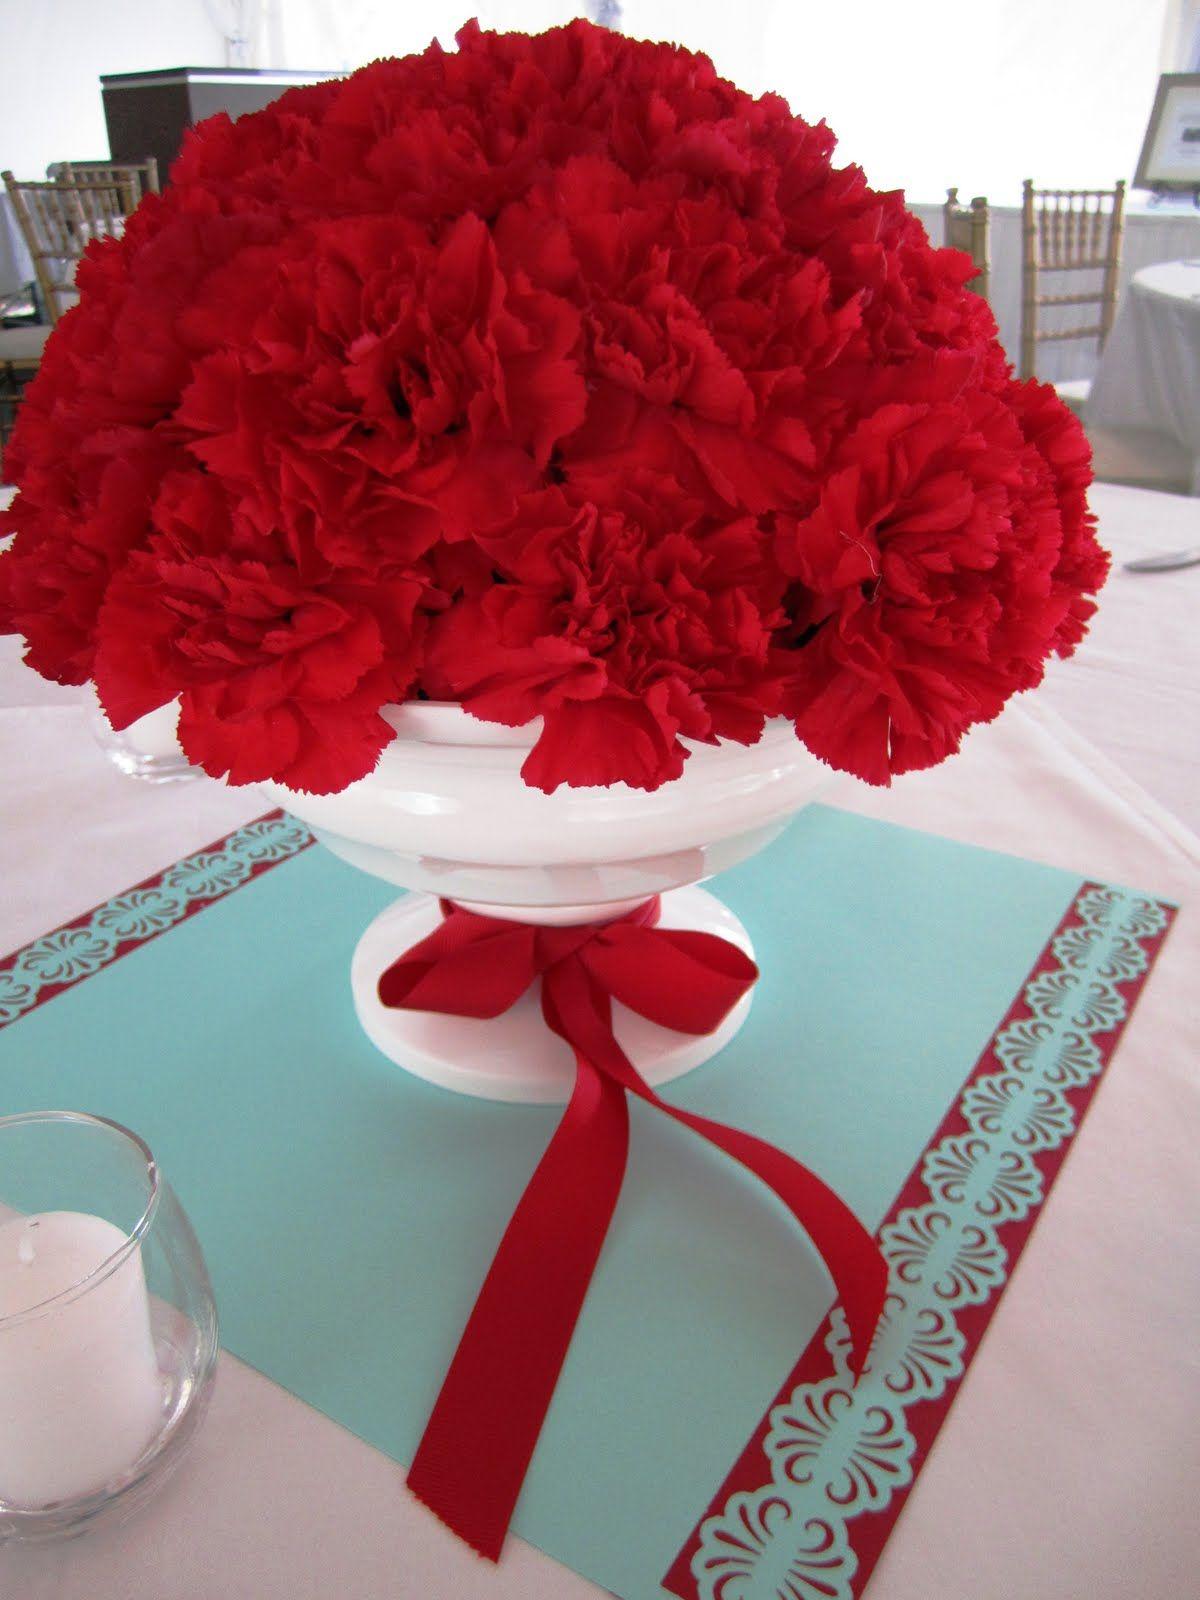 Jeff French Floral Event Design September 2010 Red Wedding Floral Event Design Red Carnation